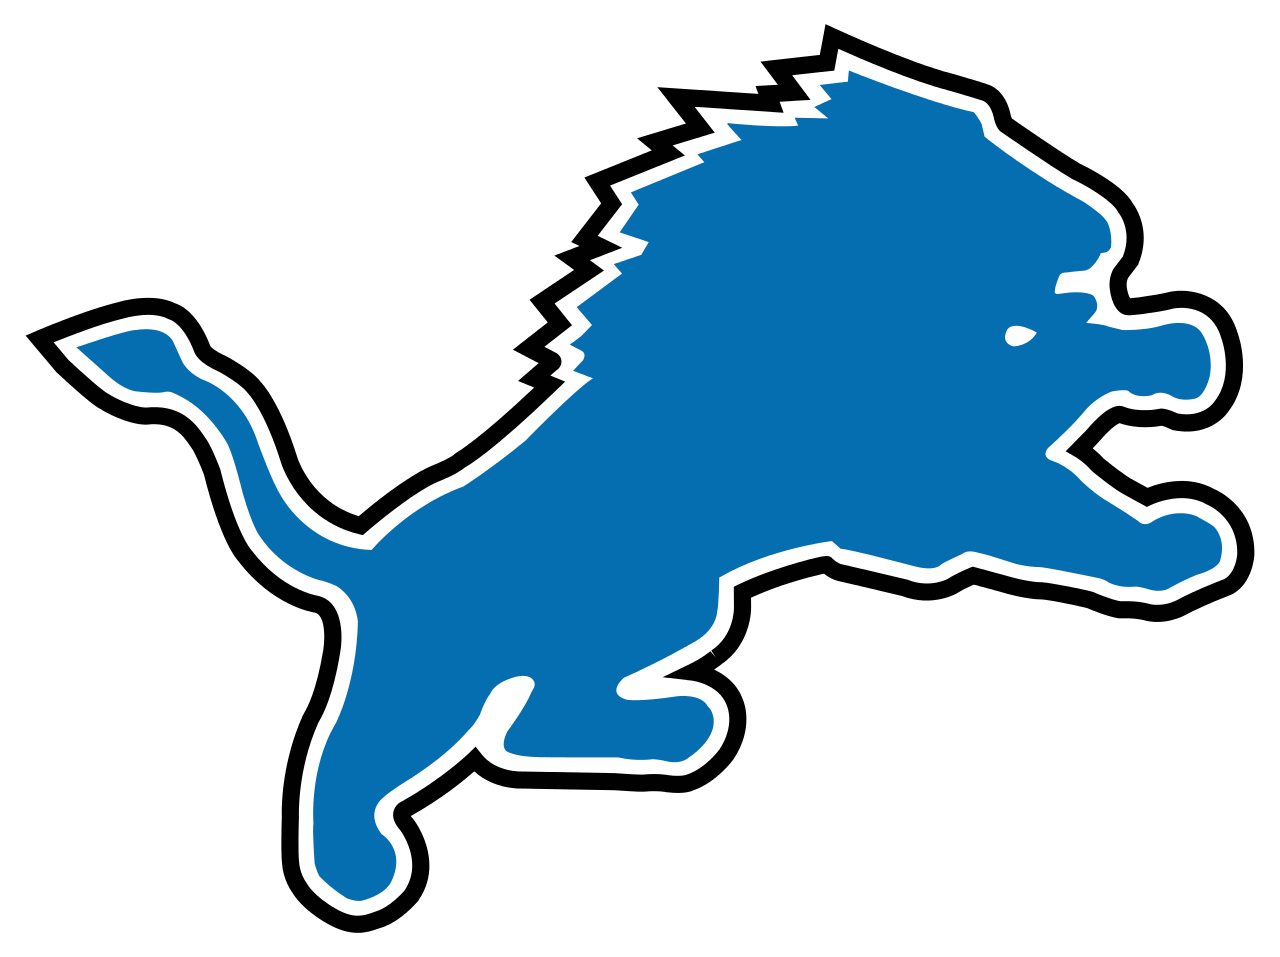 Detroit lions old Logos